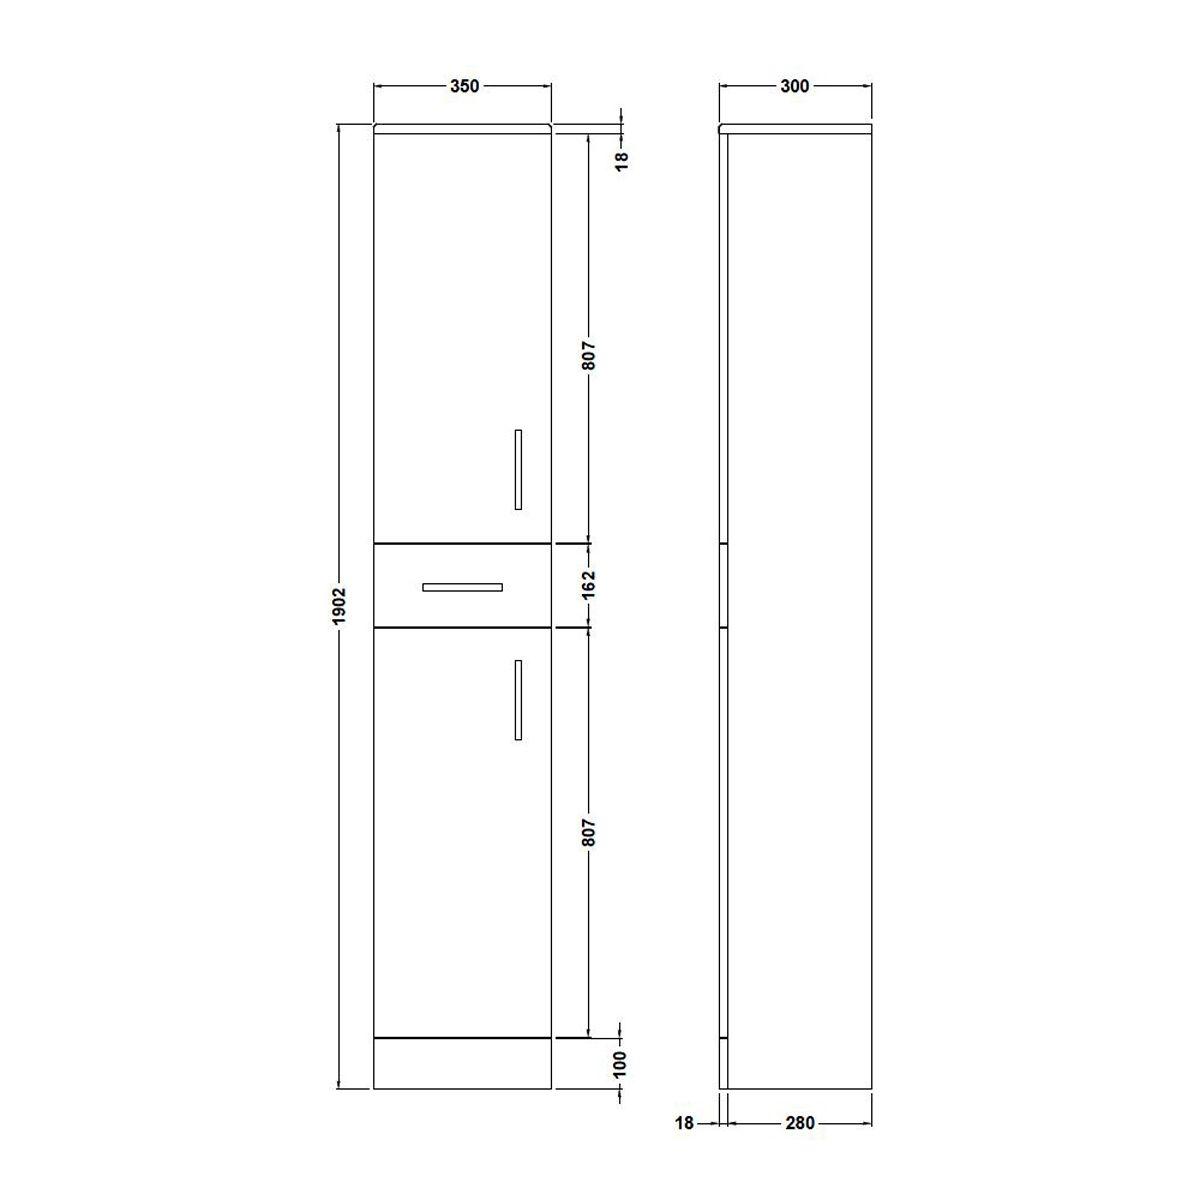 Premier High Gloss White Tall Boy Storage Unit Dimensions